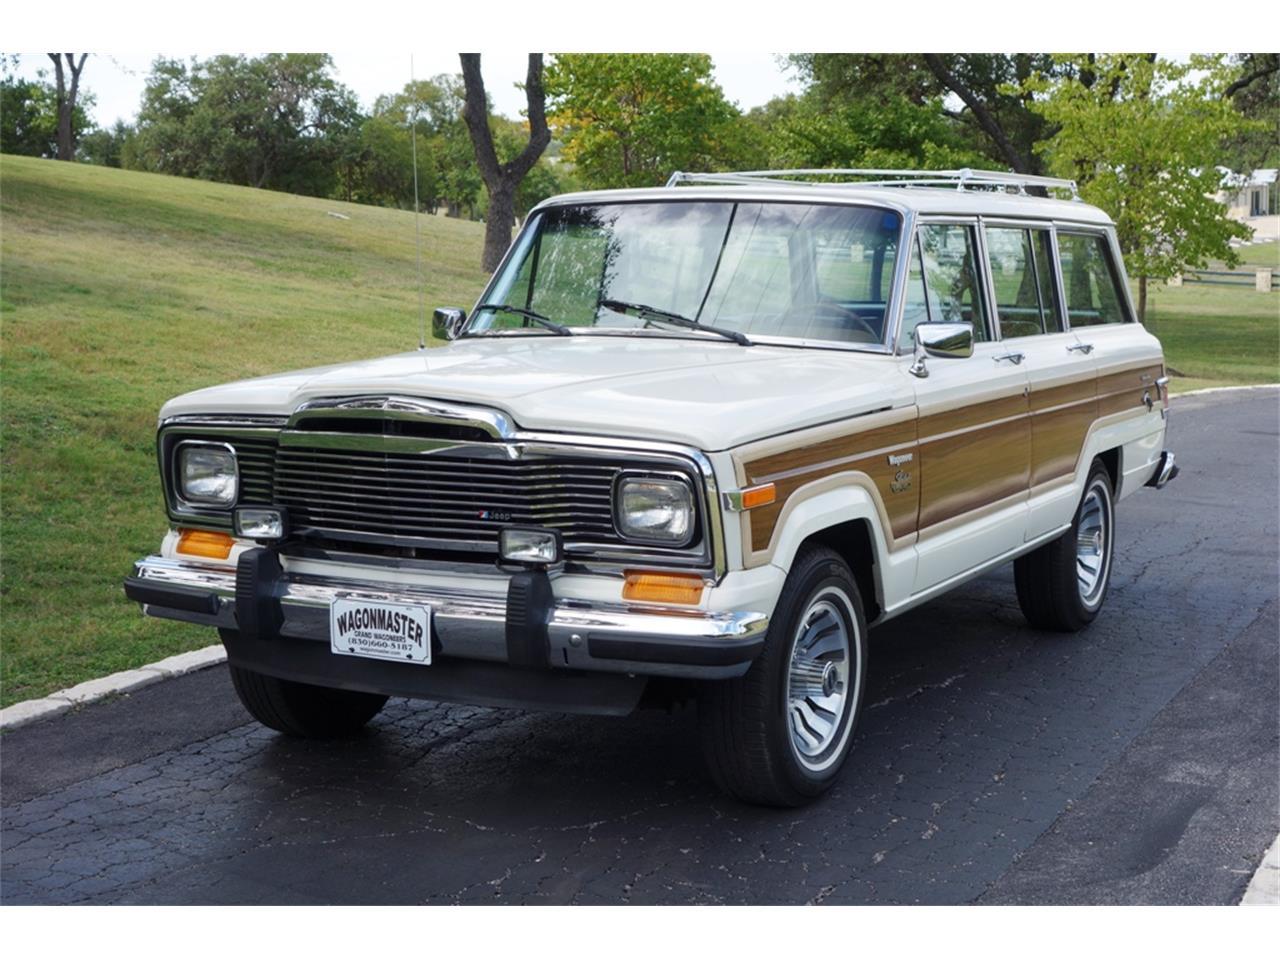 1980 Jeep Wagoneer For Sale Classiccars Com Cc 1019512